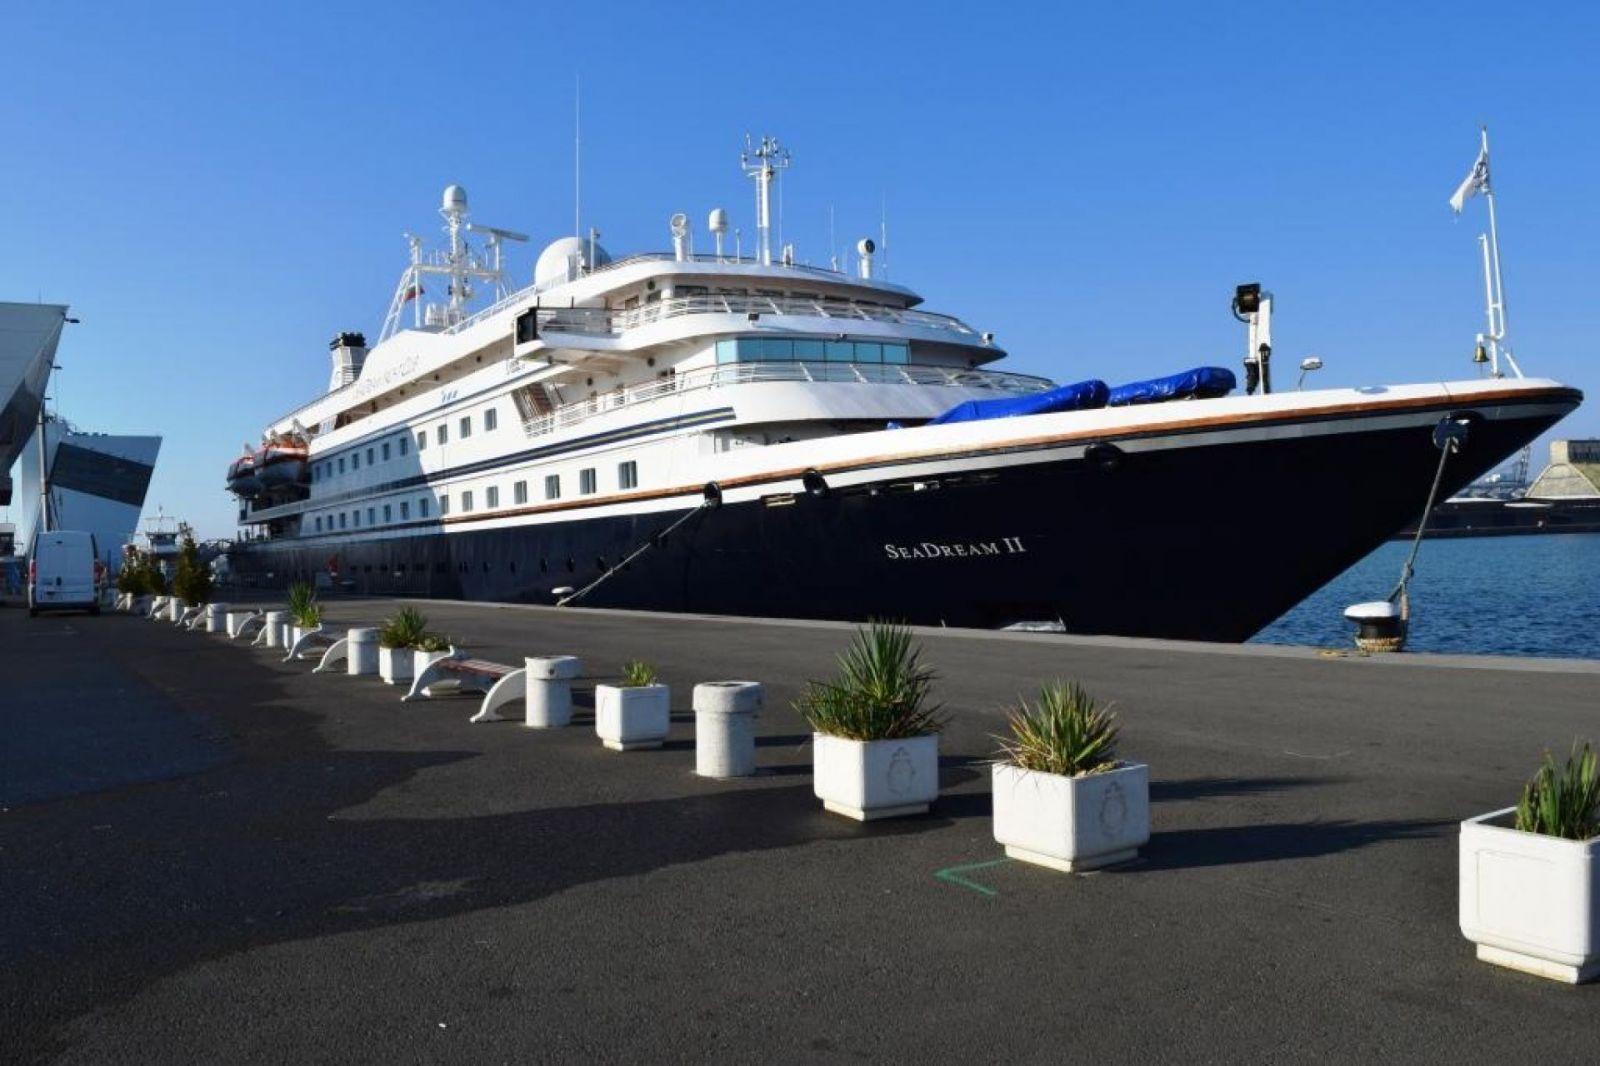 "Снимки: Второ посещение на круизния кораб ""SeaDream II"" в пристанище Бургас"